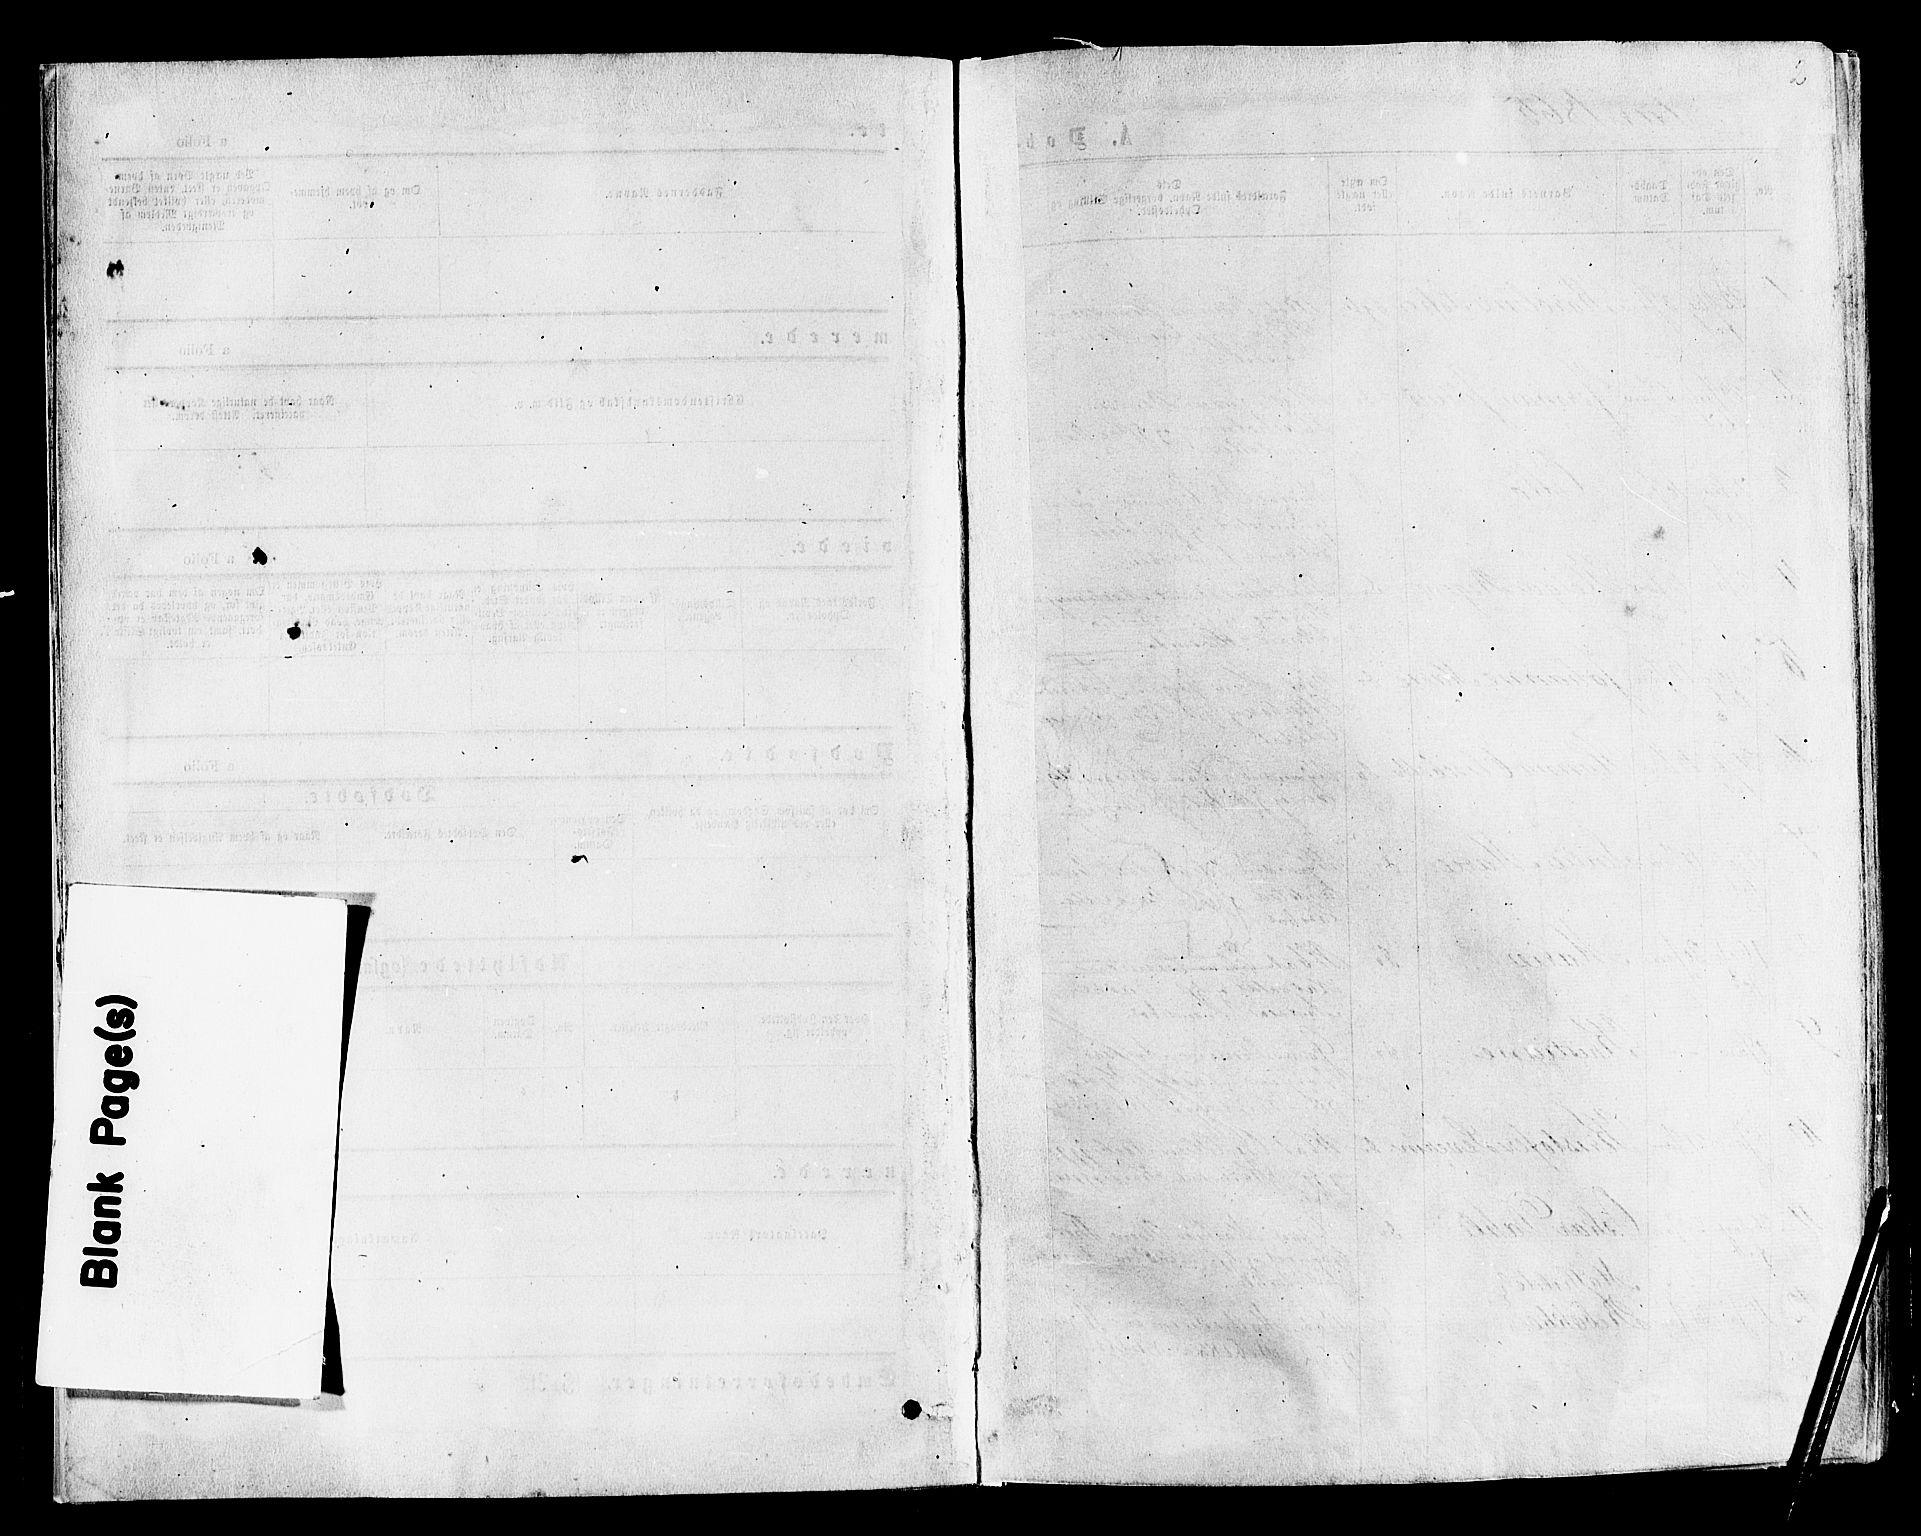 SAKO, Nøtterøy kirkebøker, F/Fa/L0007: Ministerialbok nr. I 7, 1865-1877, s. 2